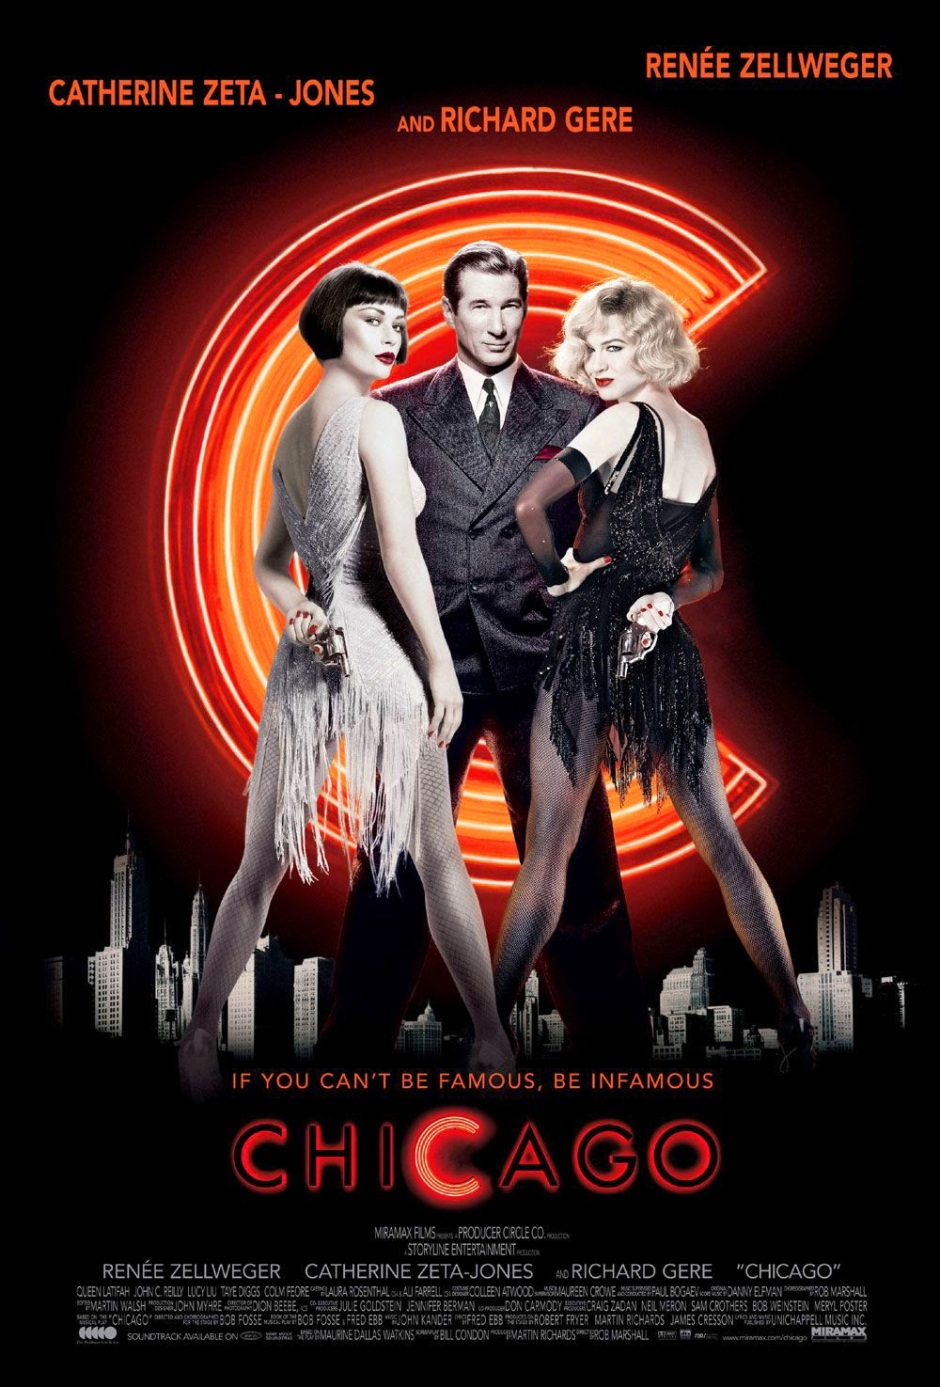 poster cartel pelicula cine poster chicago musical movie